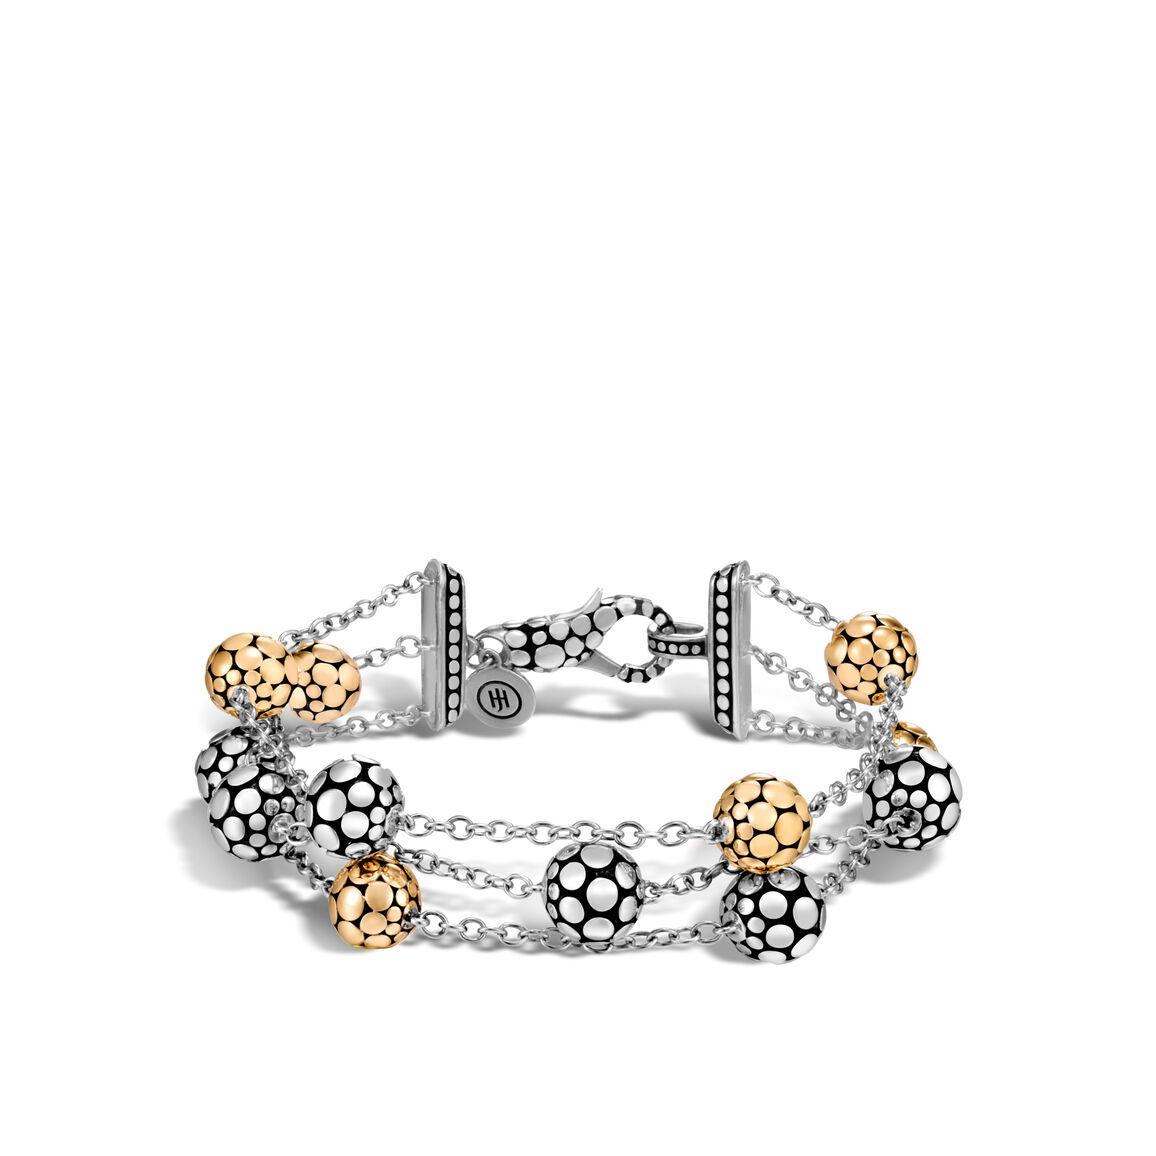 Dot Triple Row Bracelet in Silver and 18K Gold